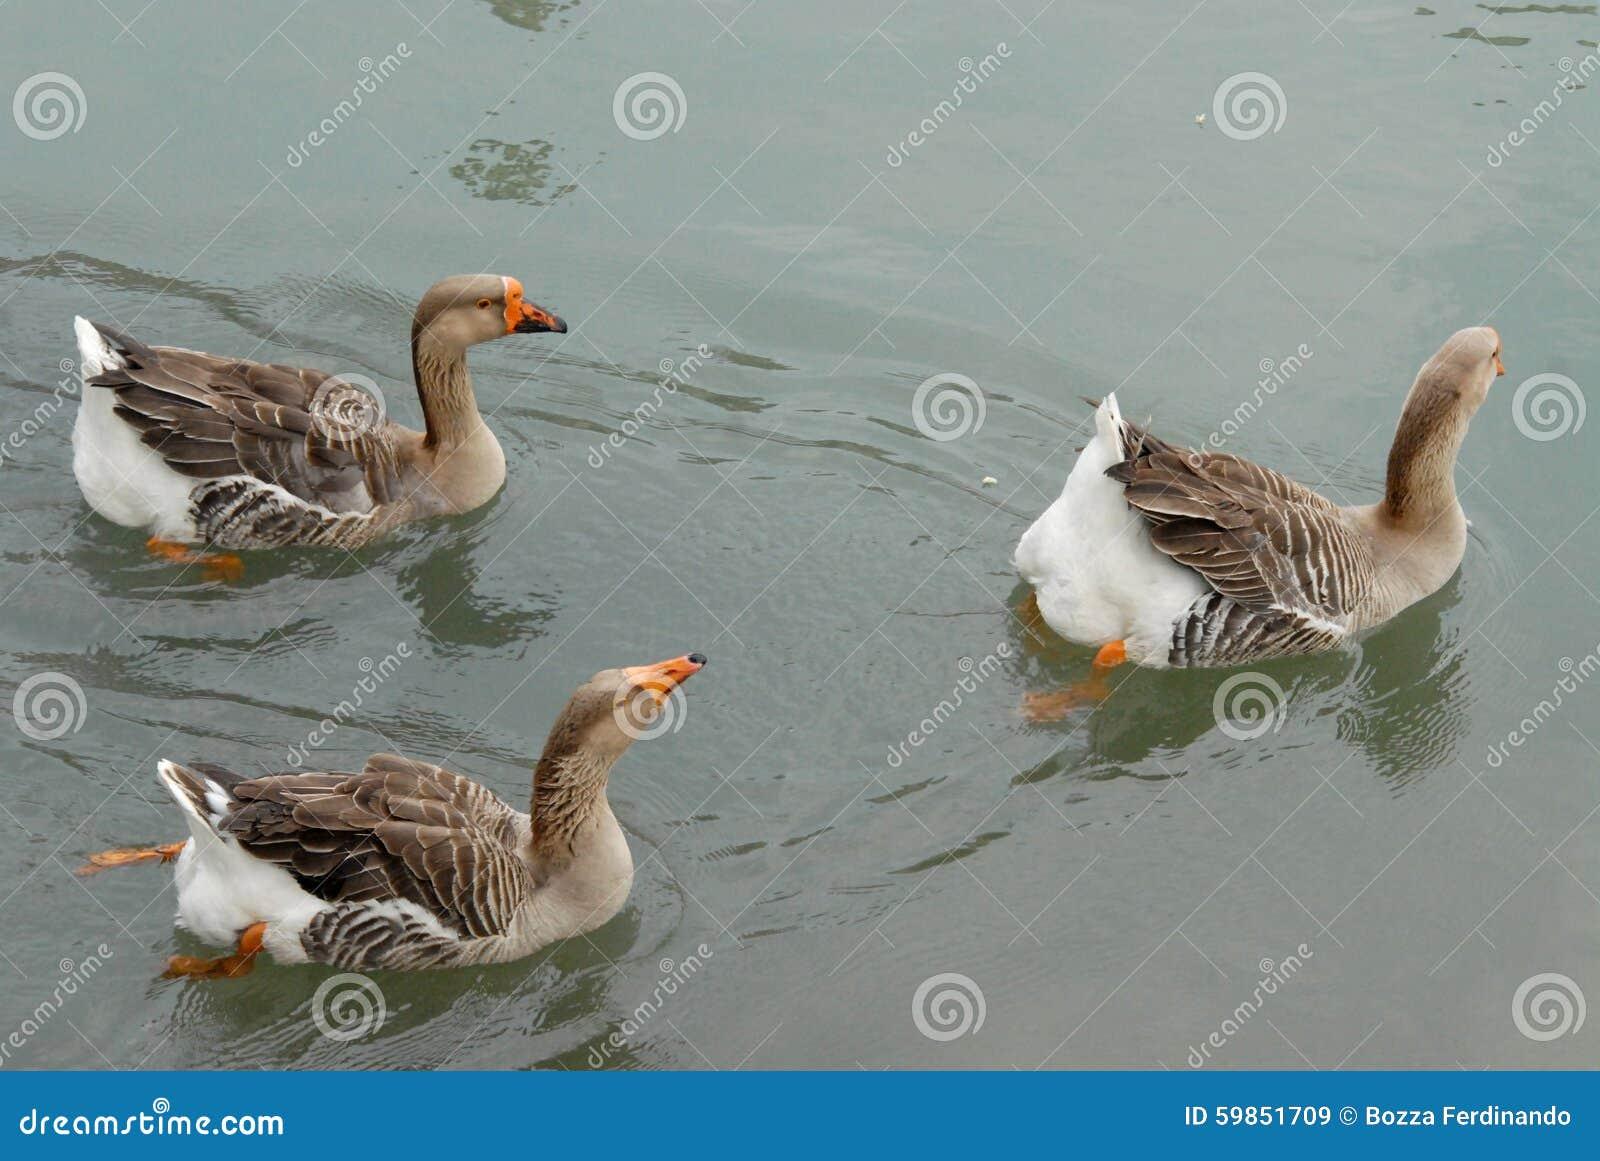 Drie ganzen die in Dolo in Brenta in de provincie van Venetië in Veneto zwemmen (Italië)